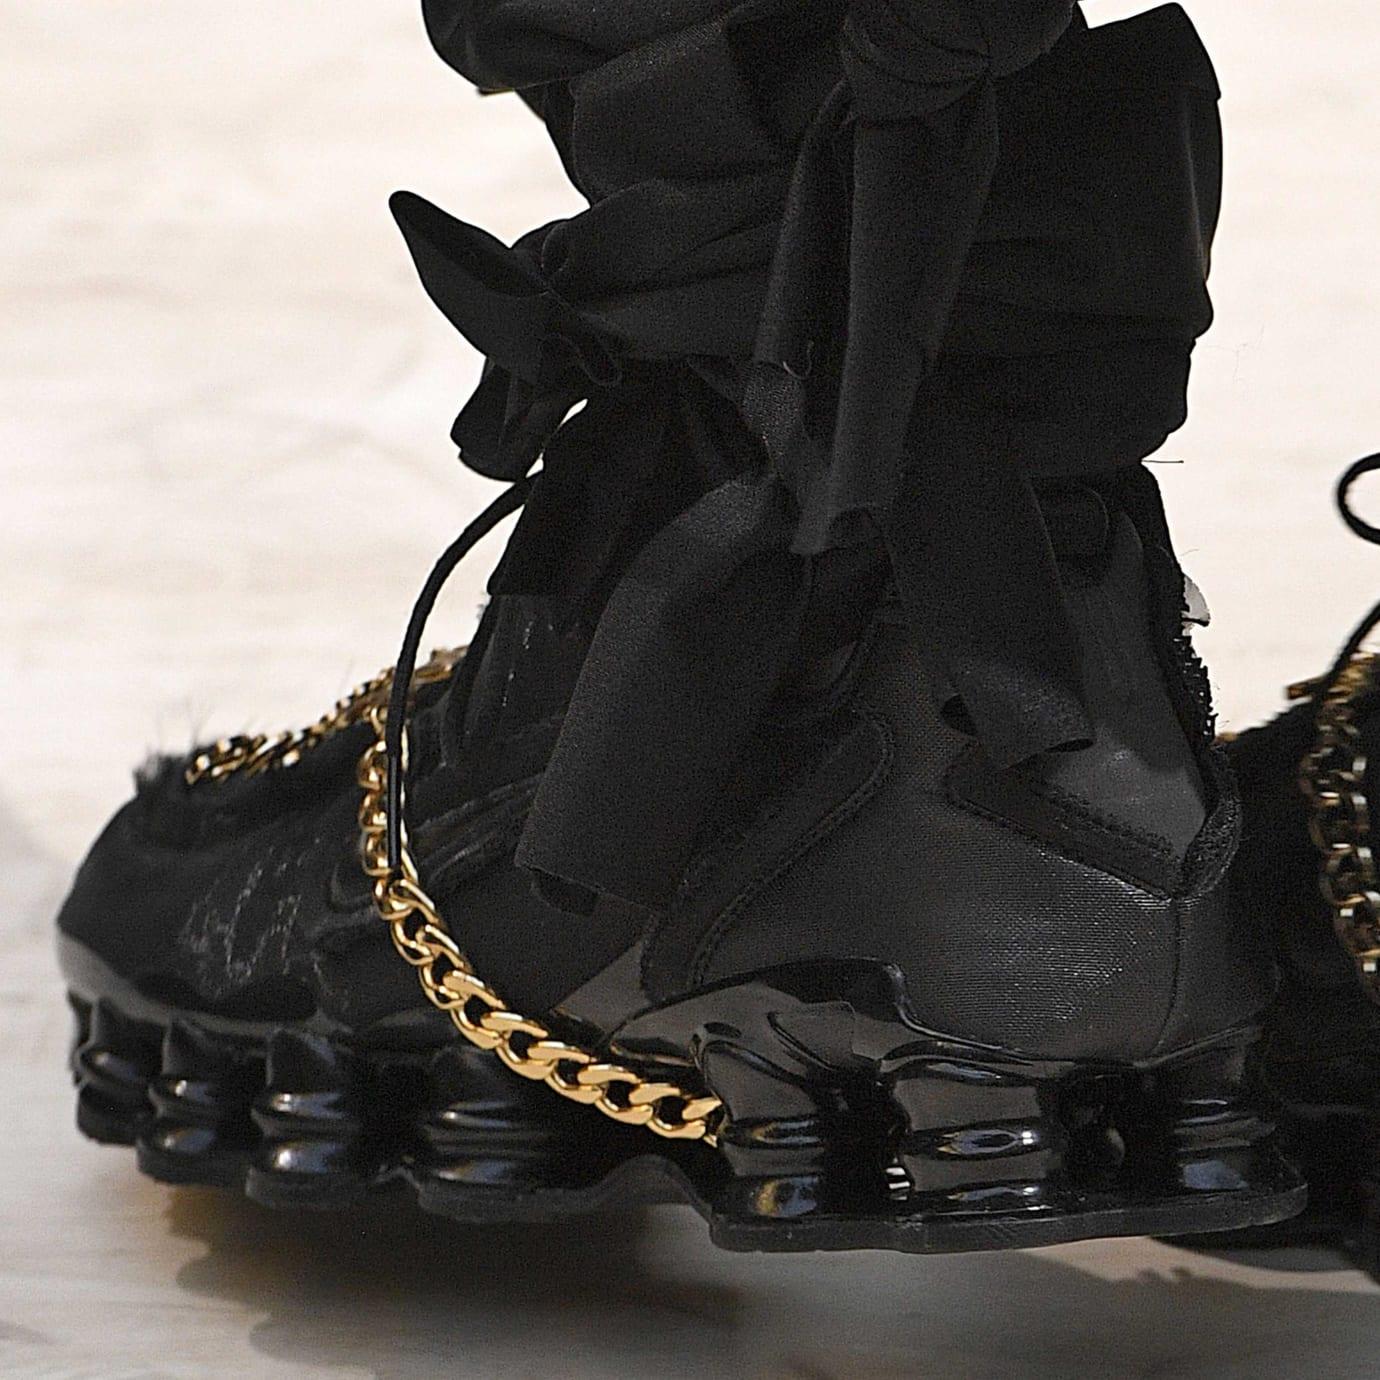 Comme des Garcons x Nike Shox Black Heel